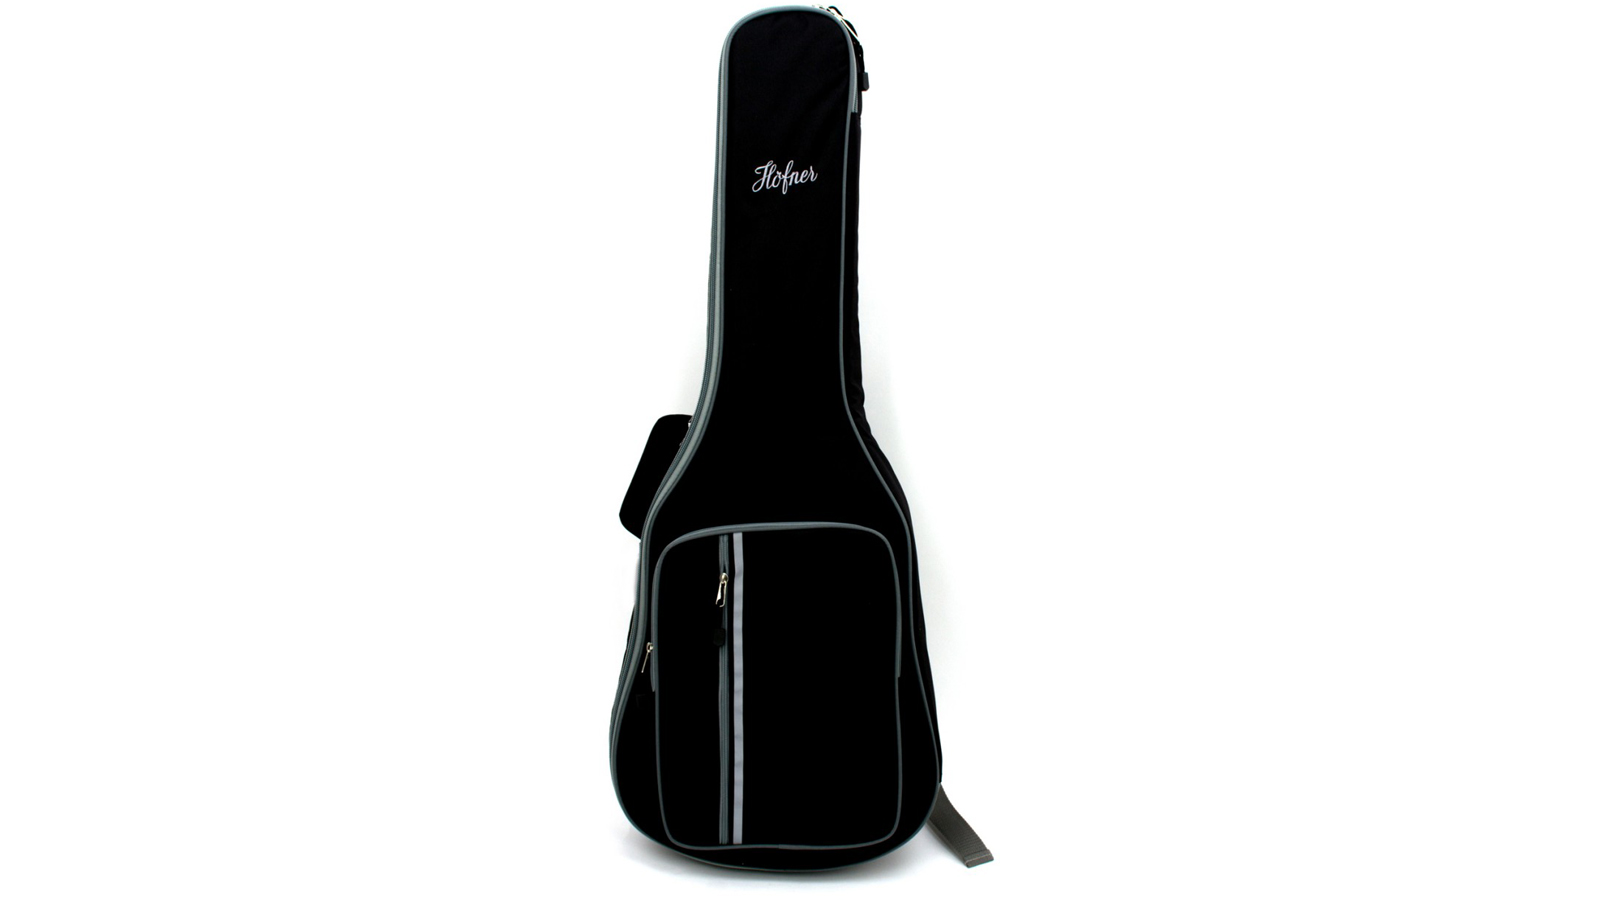 Höfner H60/4 Premium Gigbag Klassikgitarre